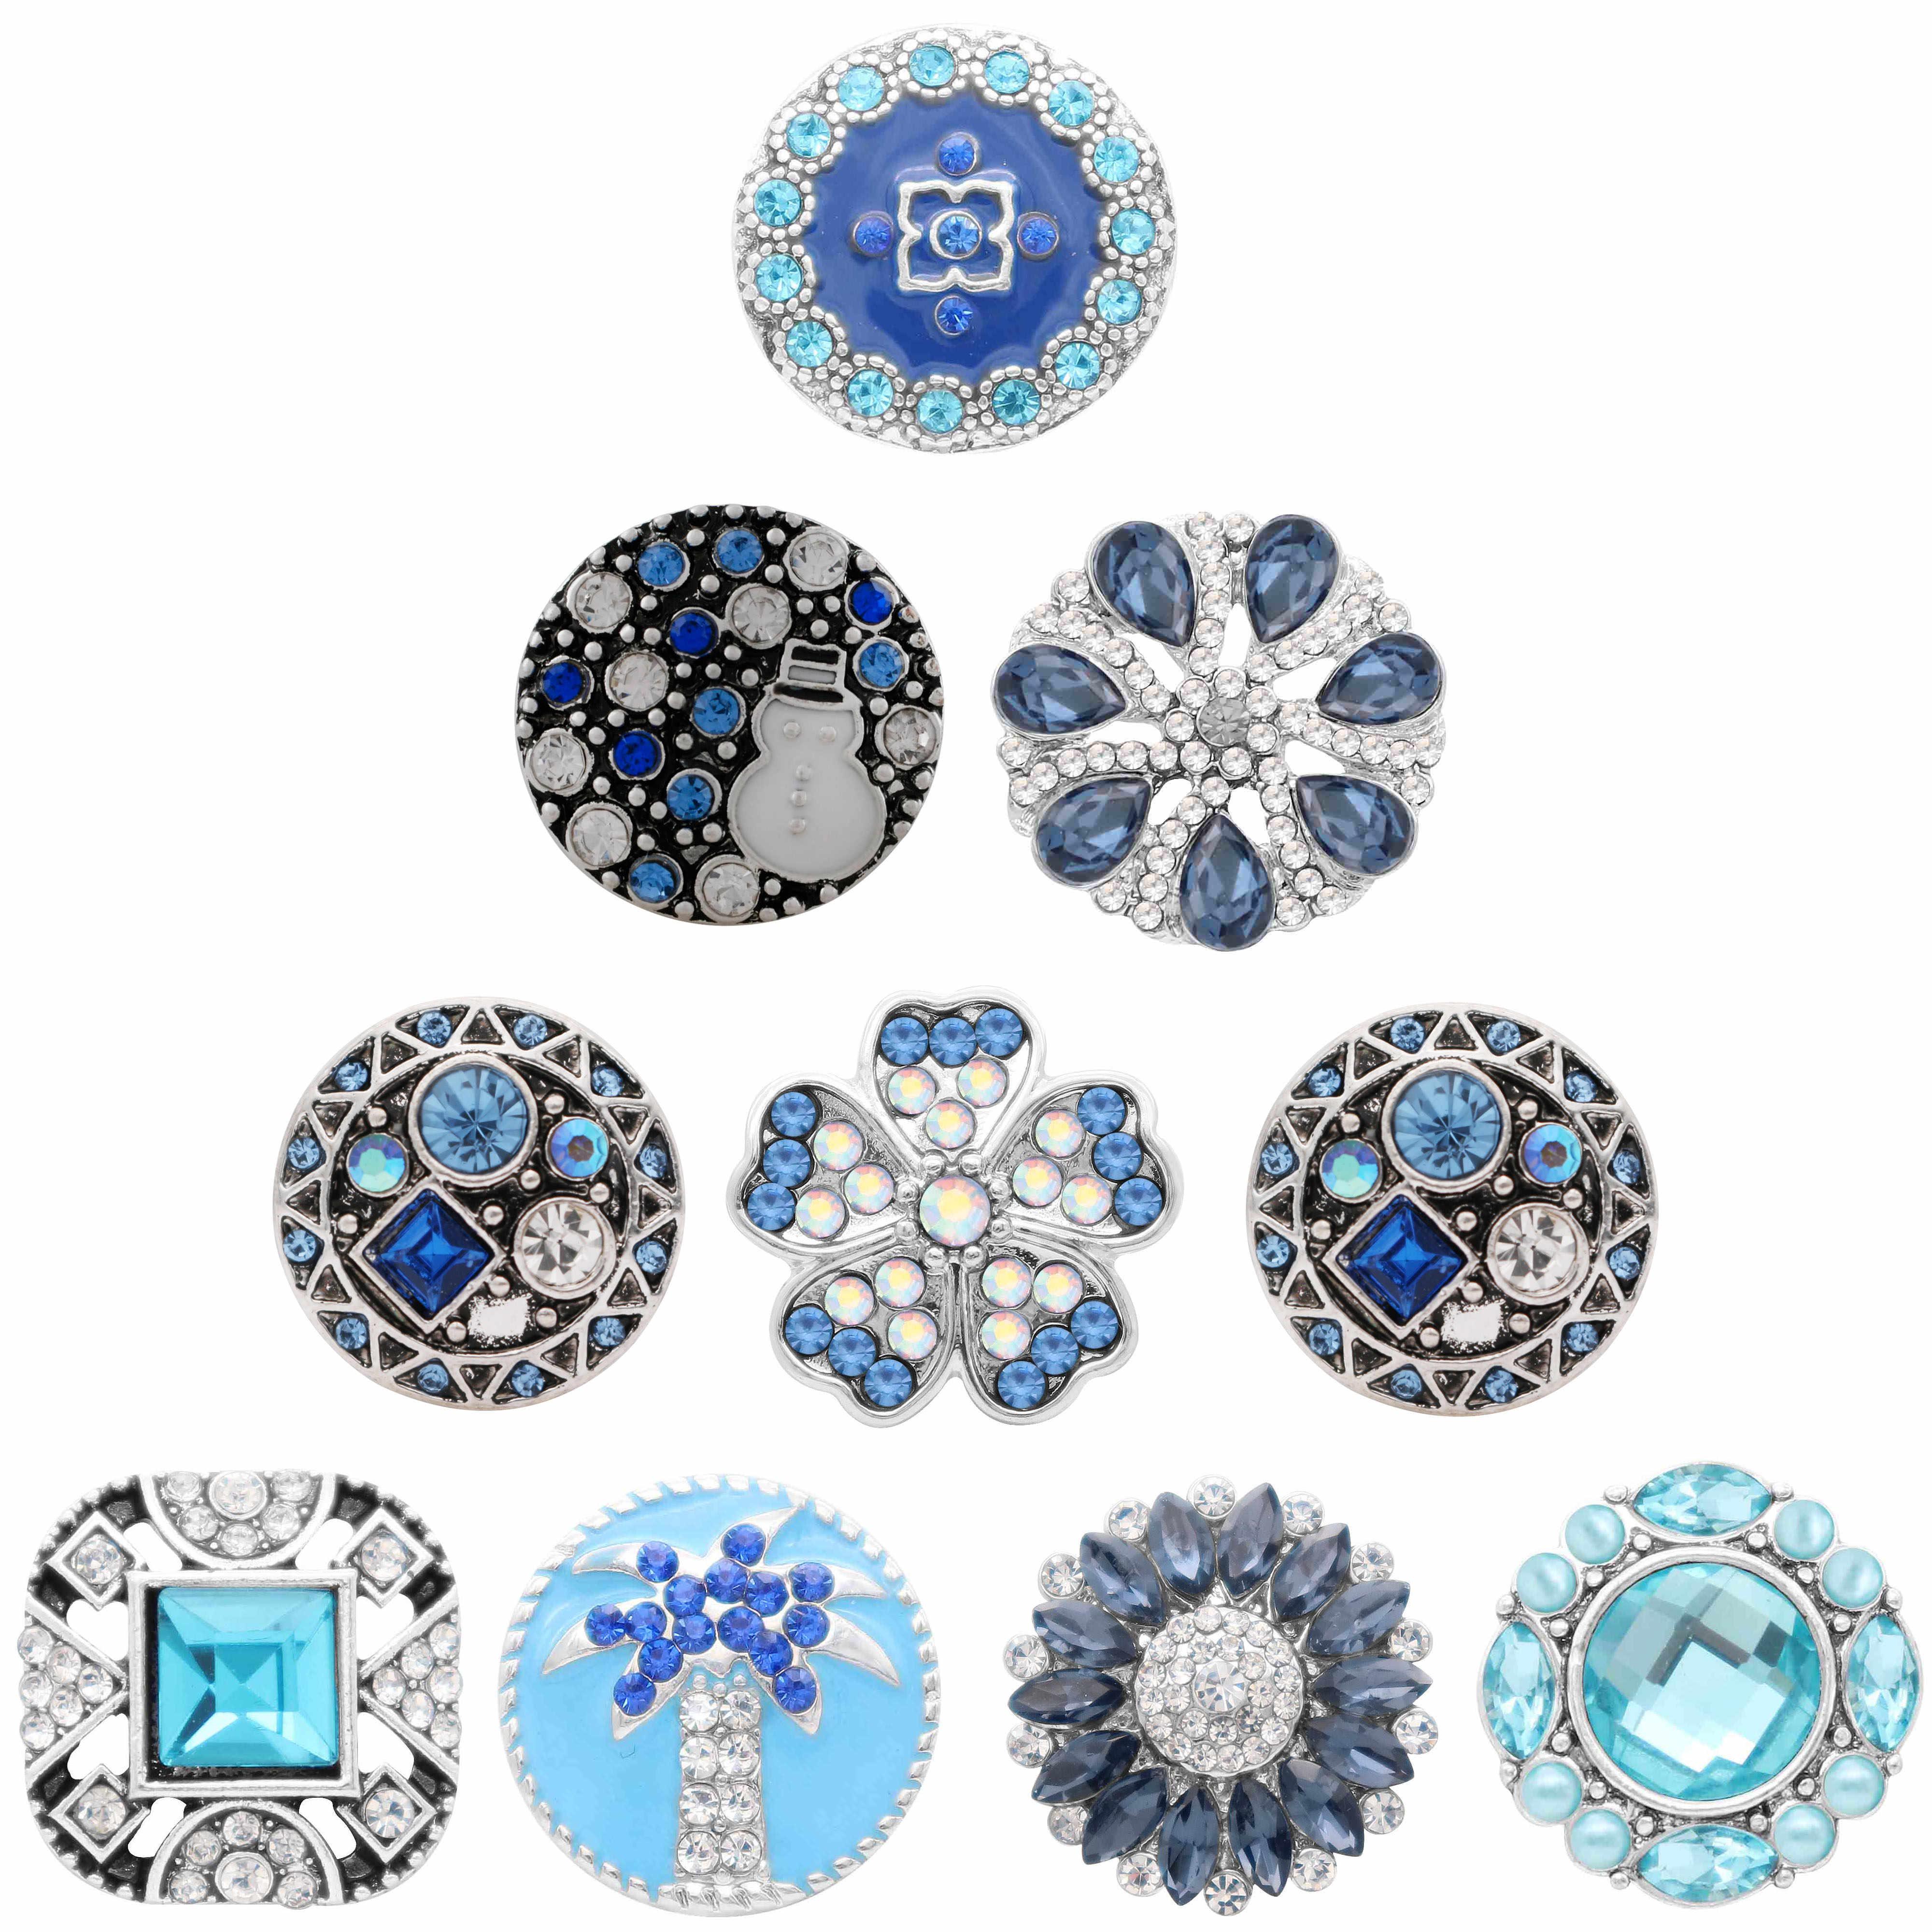 Snap Jewelry 18-20mm Blue Rhinestone Leaf Snap